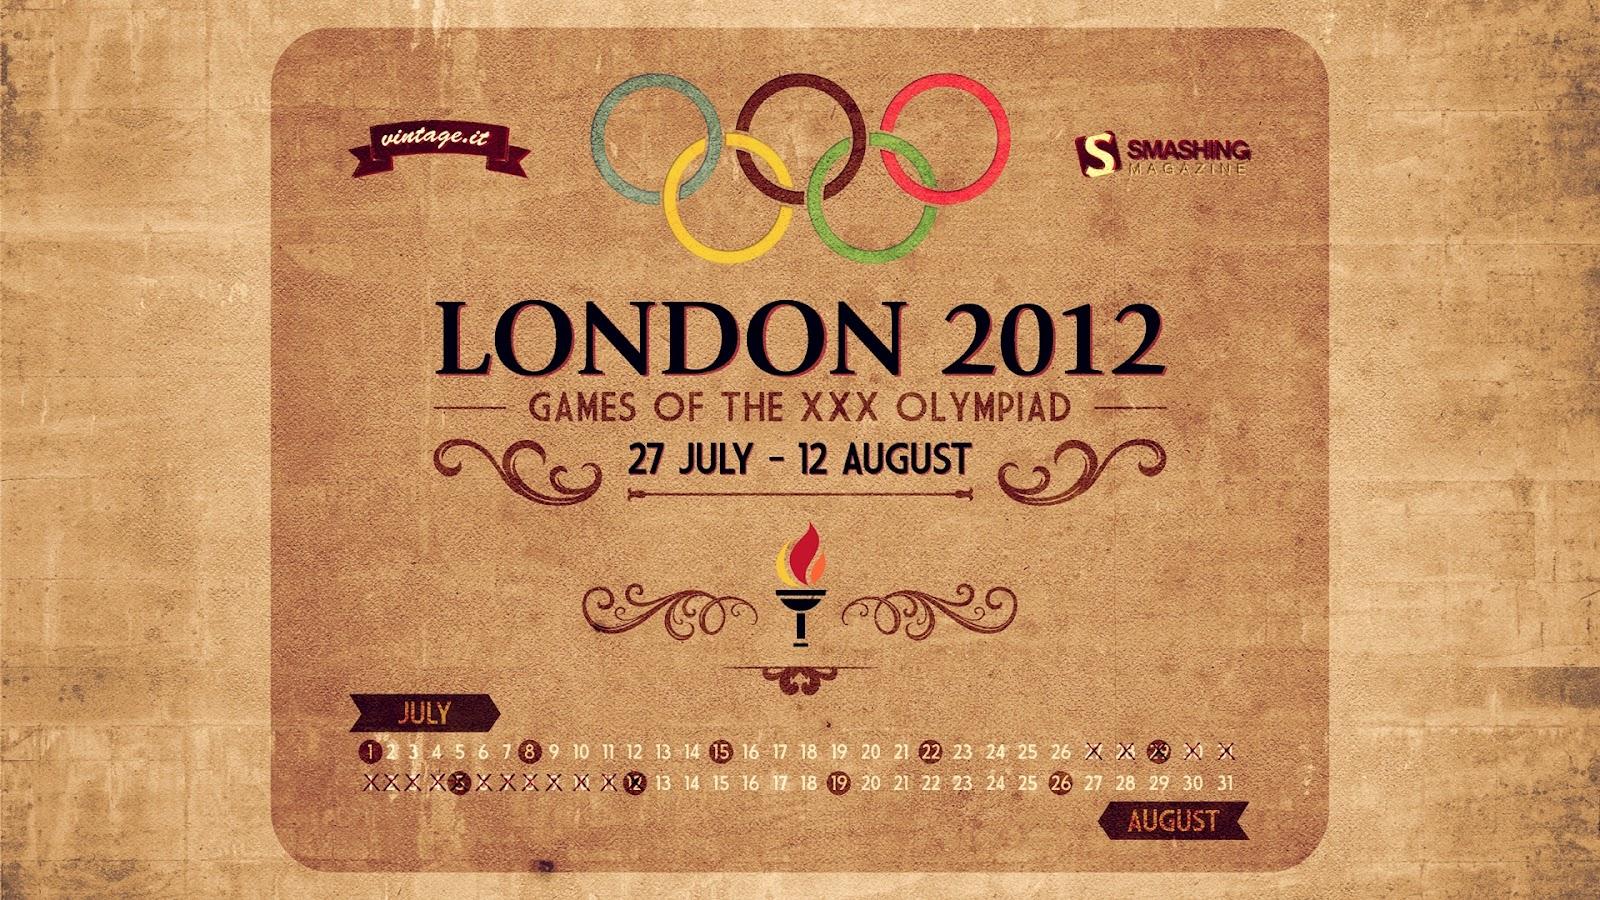 http://3.bp.blogspot.com/-wOiqB0zbFAM/T_HFVpRTnqI/AAAAAAAACZQ/uwRxBGsi-u0/s1600/Vintage+Olympics+July+Desktop+Wallpaper+Smashing+Magazine.jpg